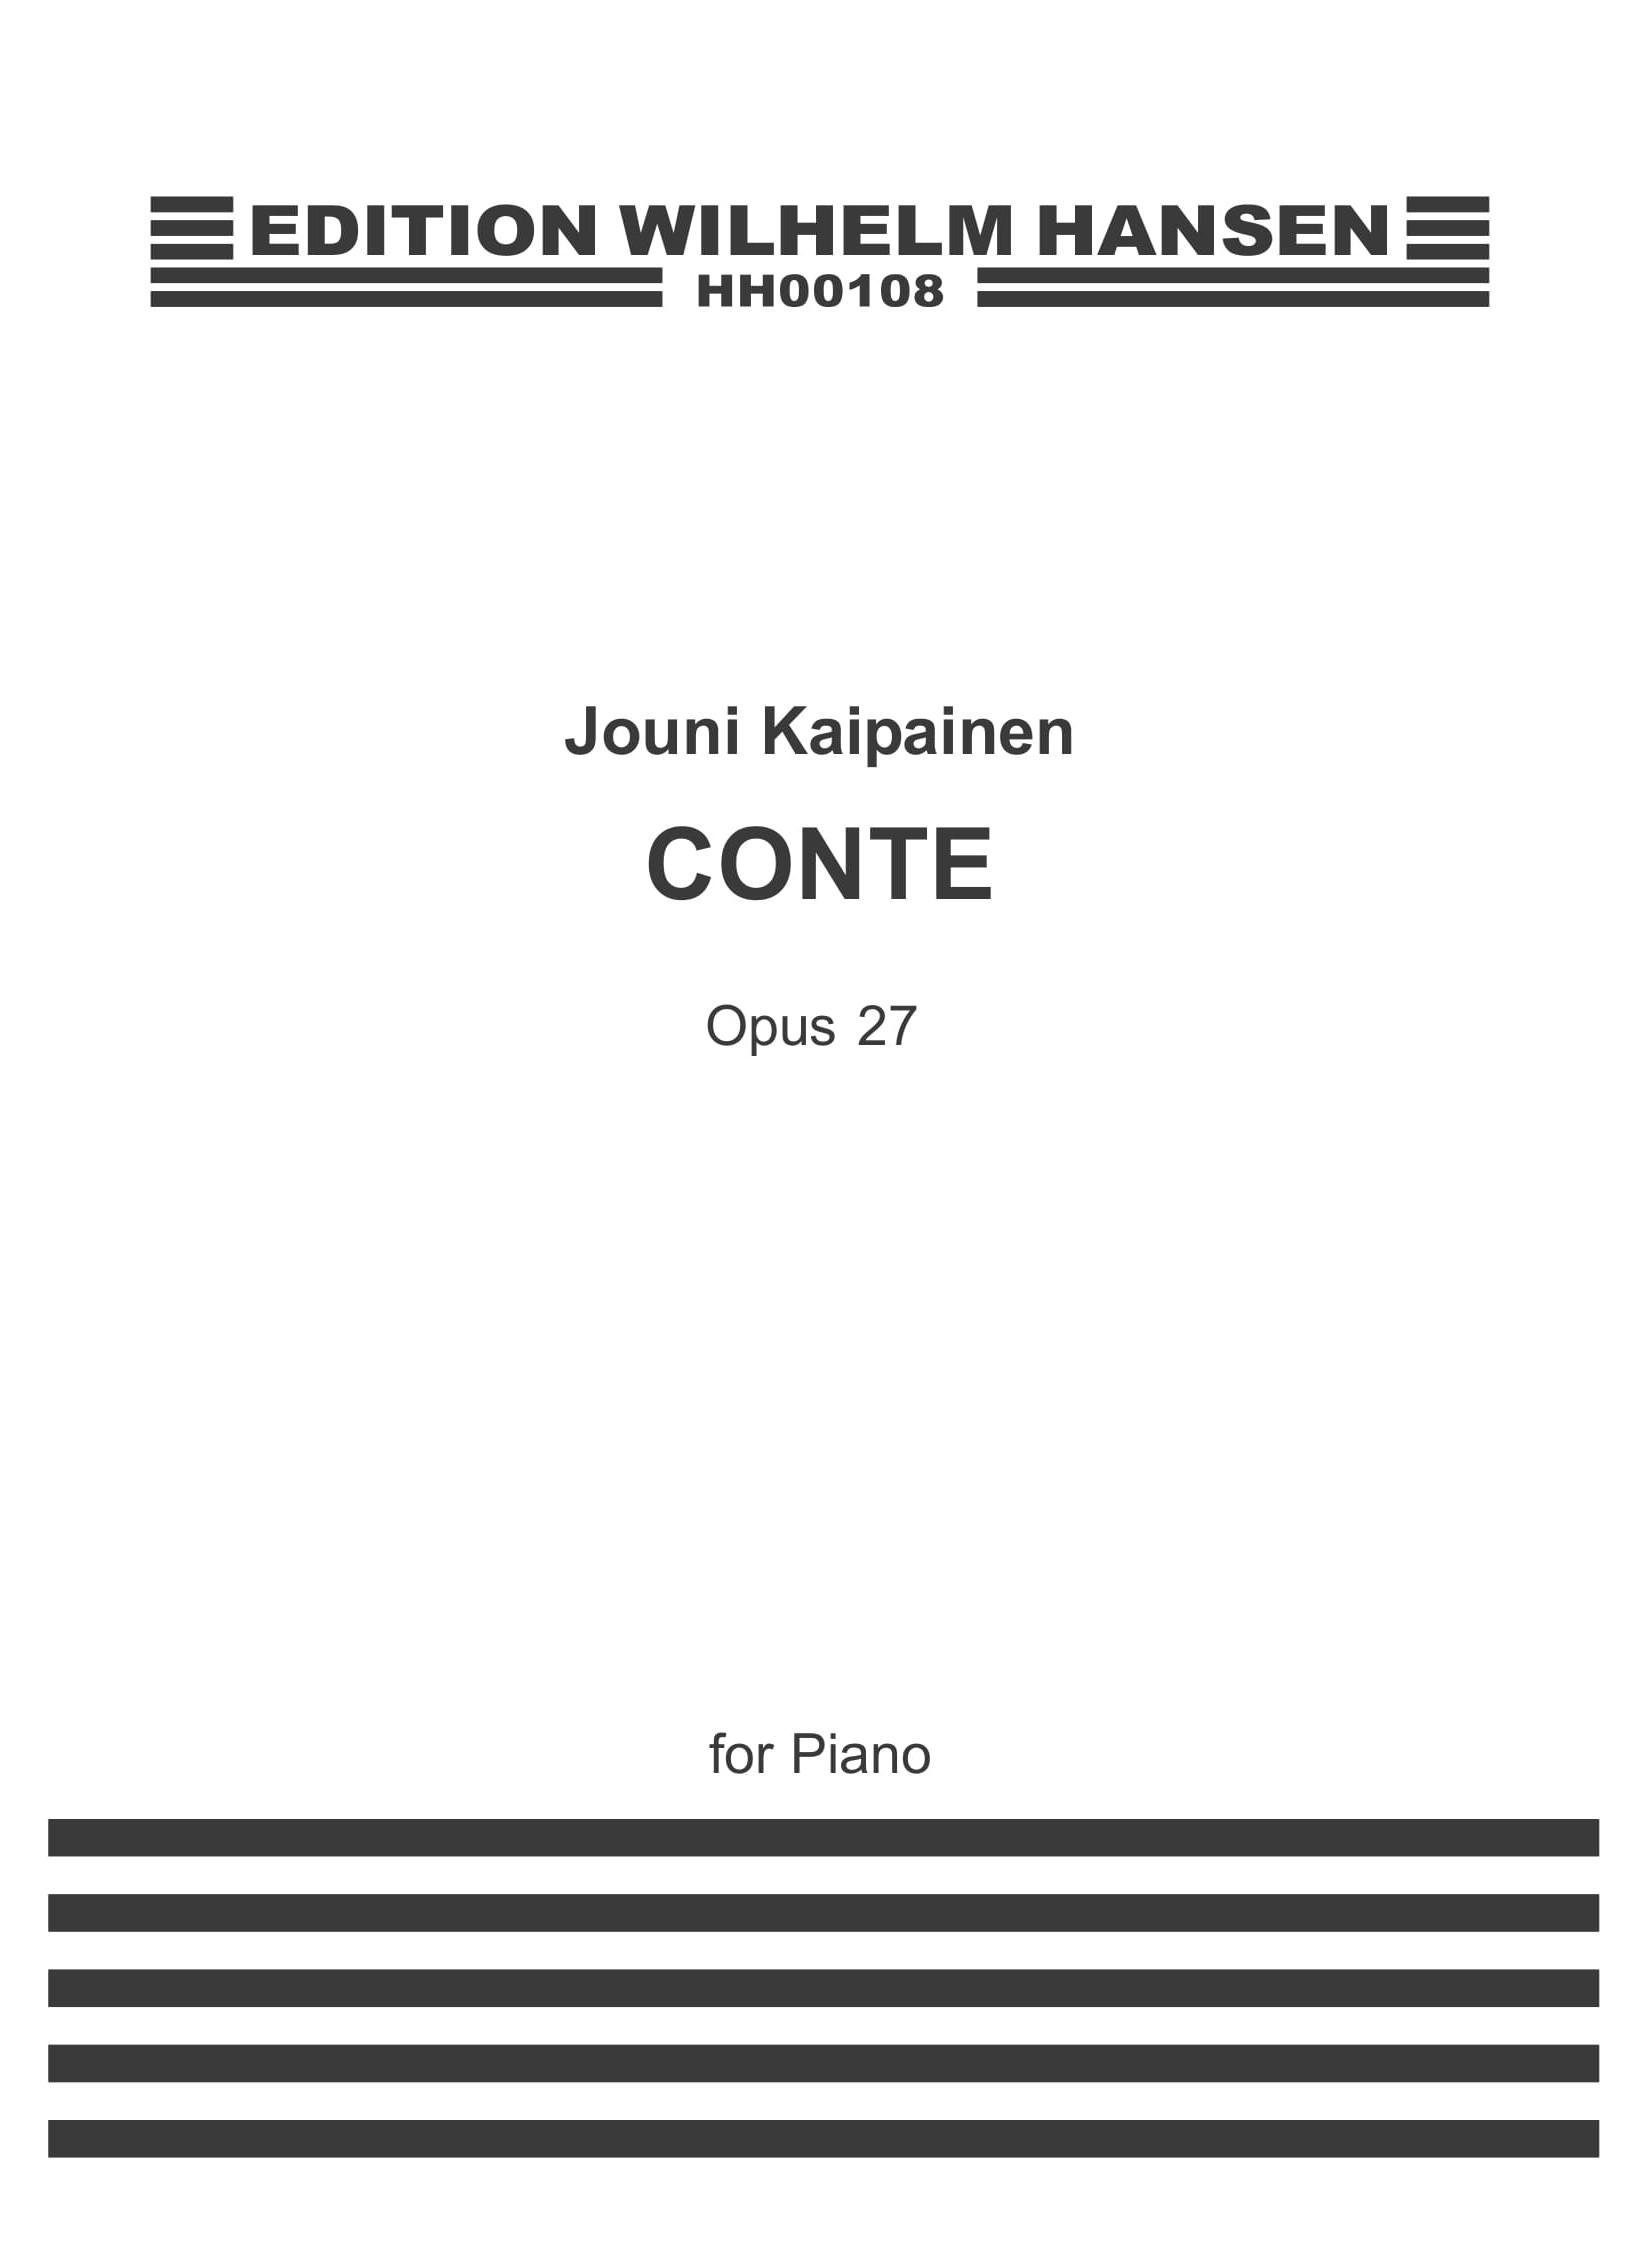 Jouni Kaipainen: Conte Op.27: Piano: Instrumental Work